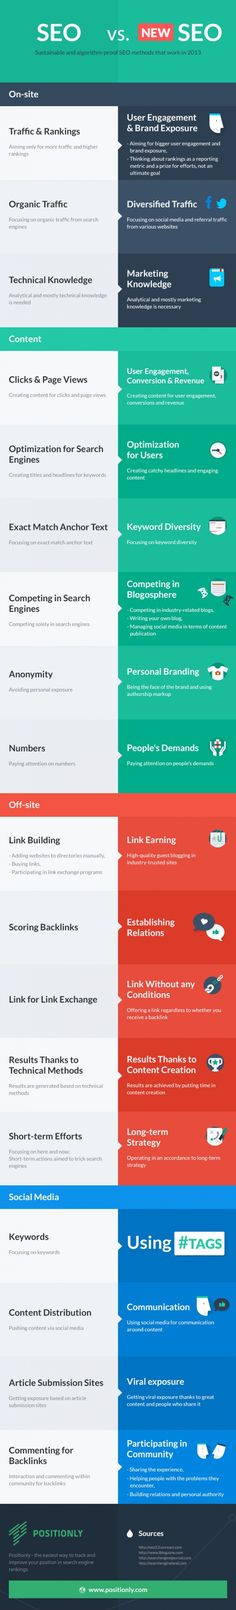 SEO ist TOD, es lebe NEW #SEO. Wie wichtig ist Social Media für erfolgreiche SEO? #SocialMedia